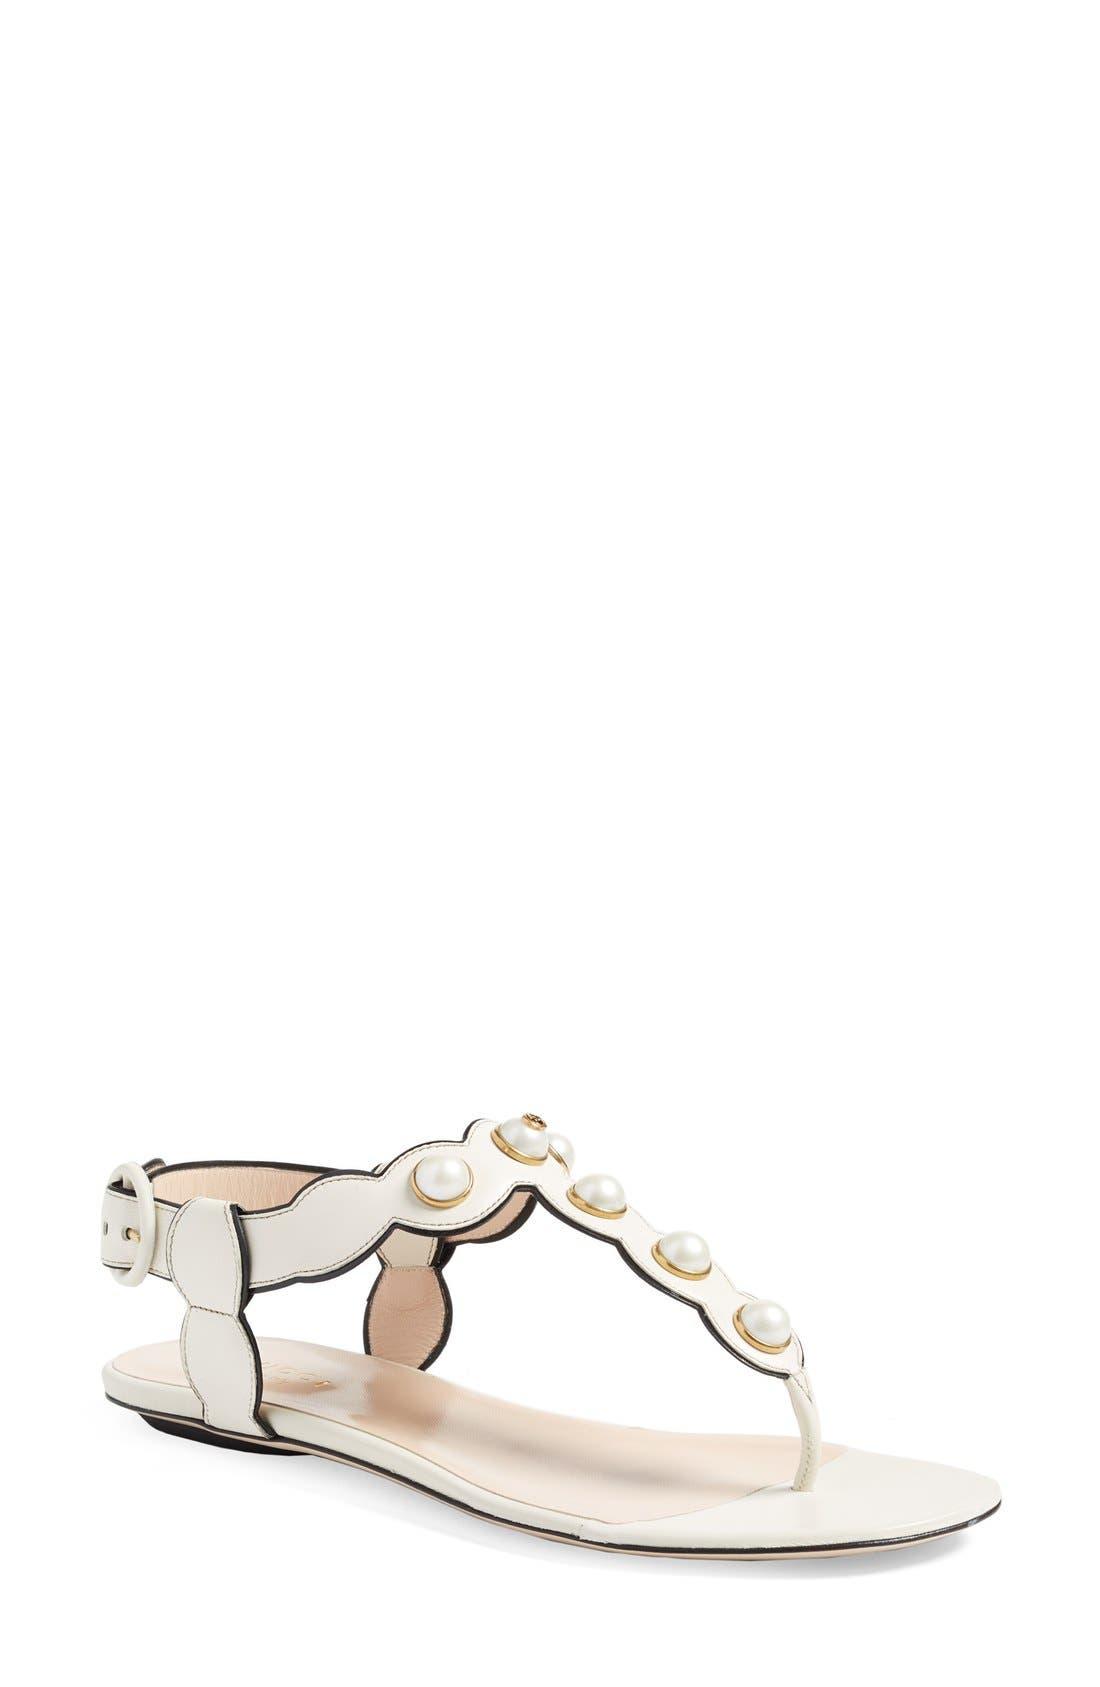 Main Image - Gucci 'Willow' Thong Sandal (Women)